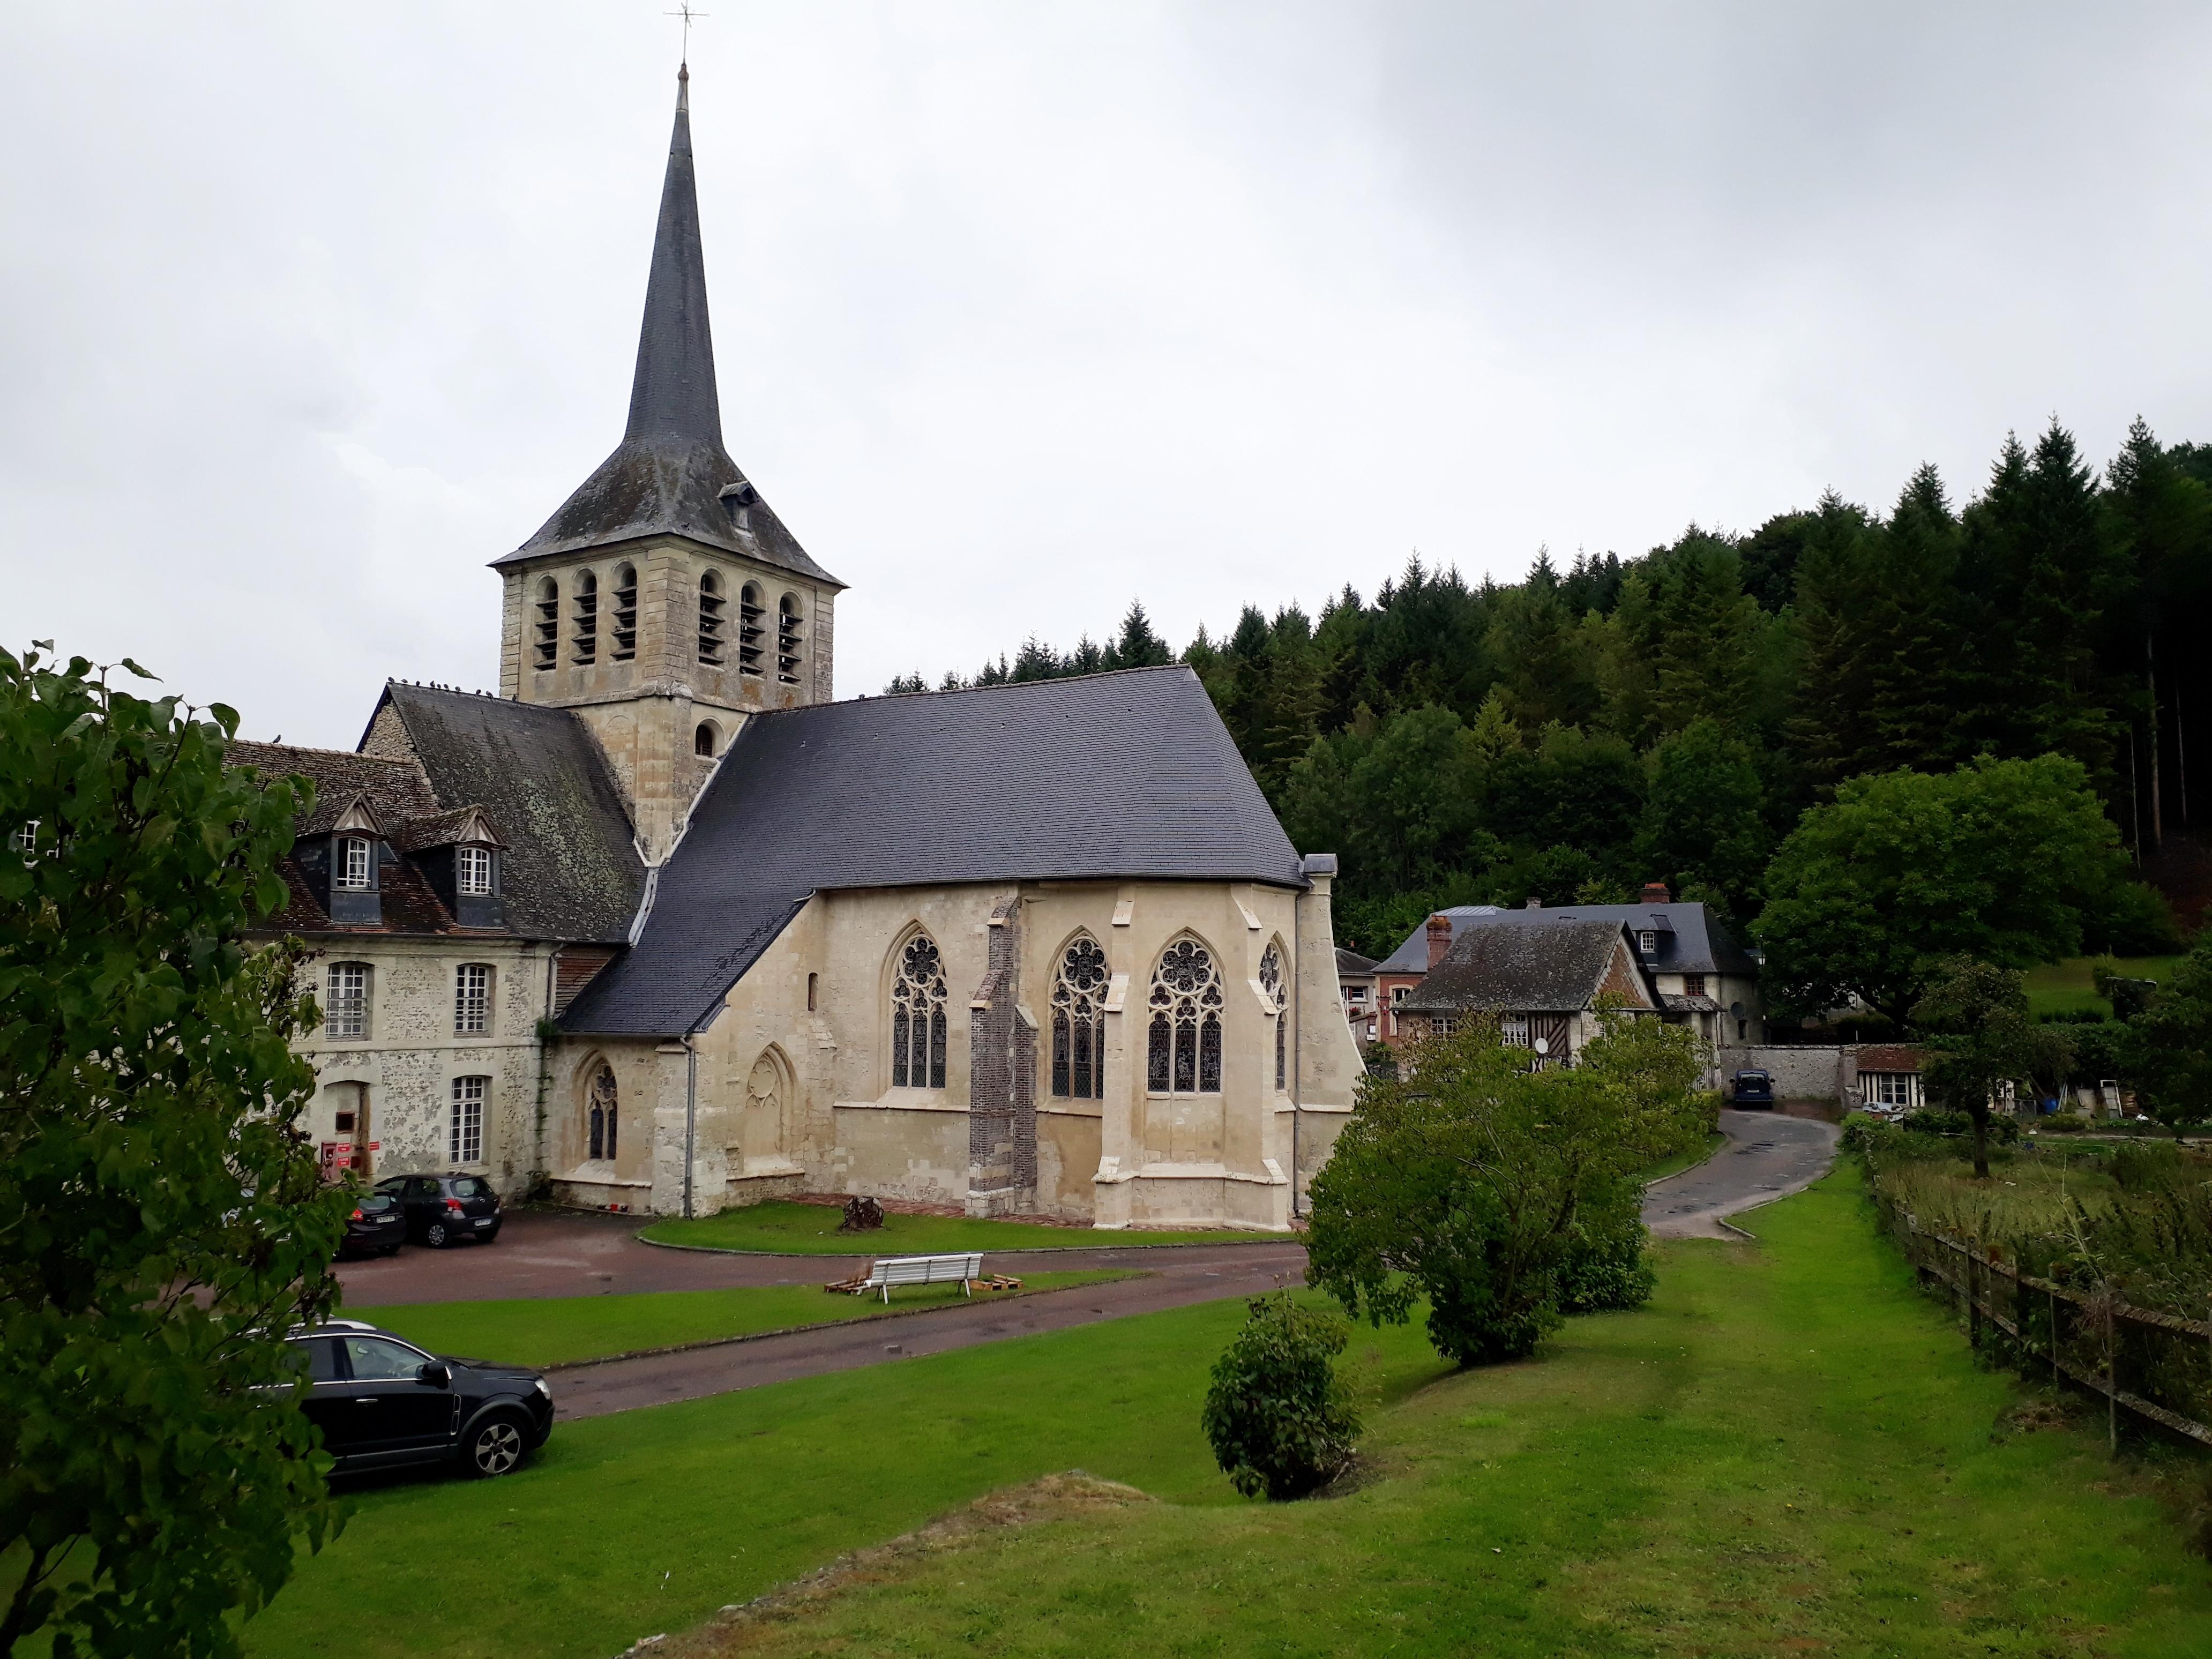 Eglise de Saint-Hymer